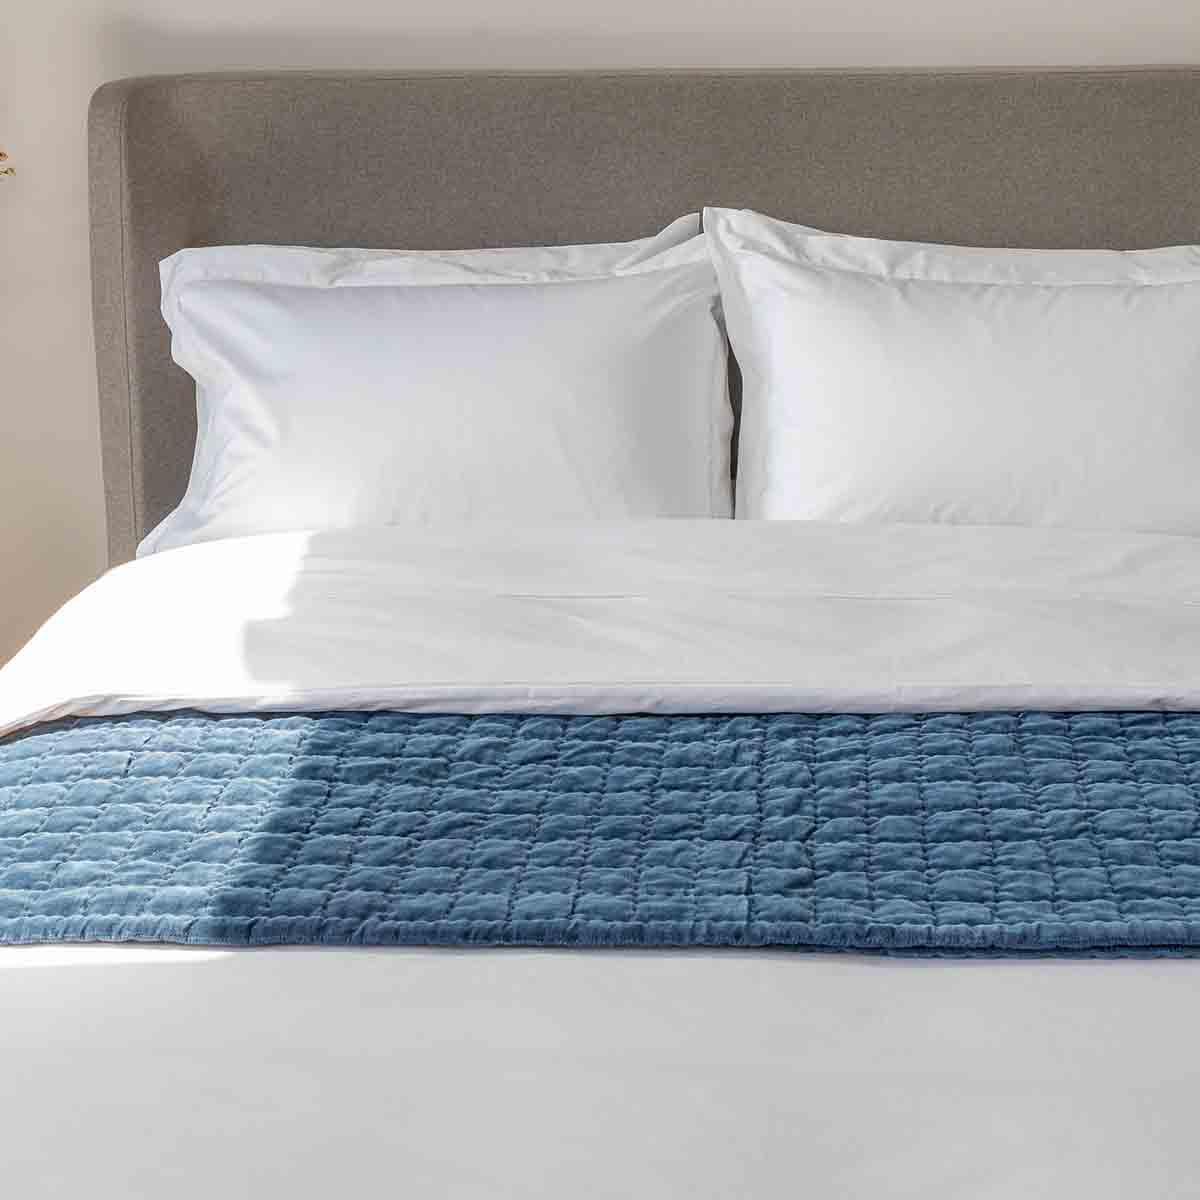 White 1000 Thread Count Supima Cotton Emperor Duvet Cover